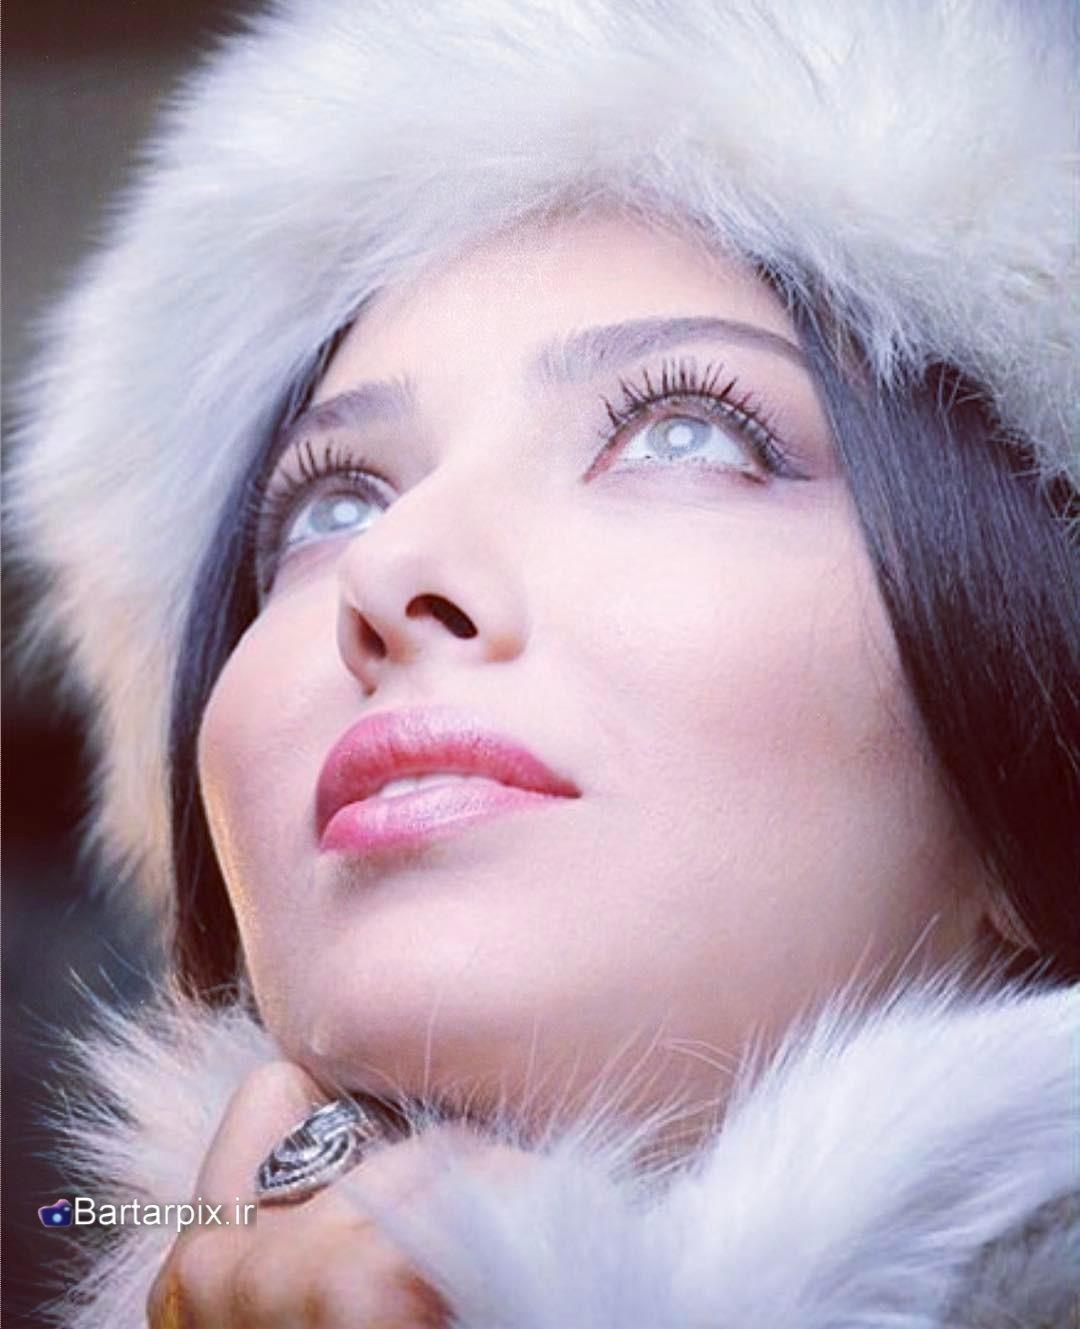 http://s9.picofile.com/file/8294606292/www_bartarpix_ir_leila_otadi_ordibehest_96_3_.jpg